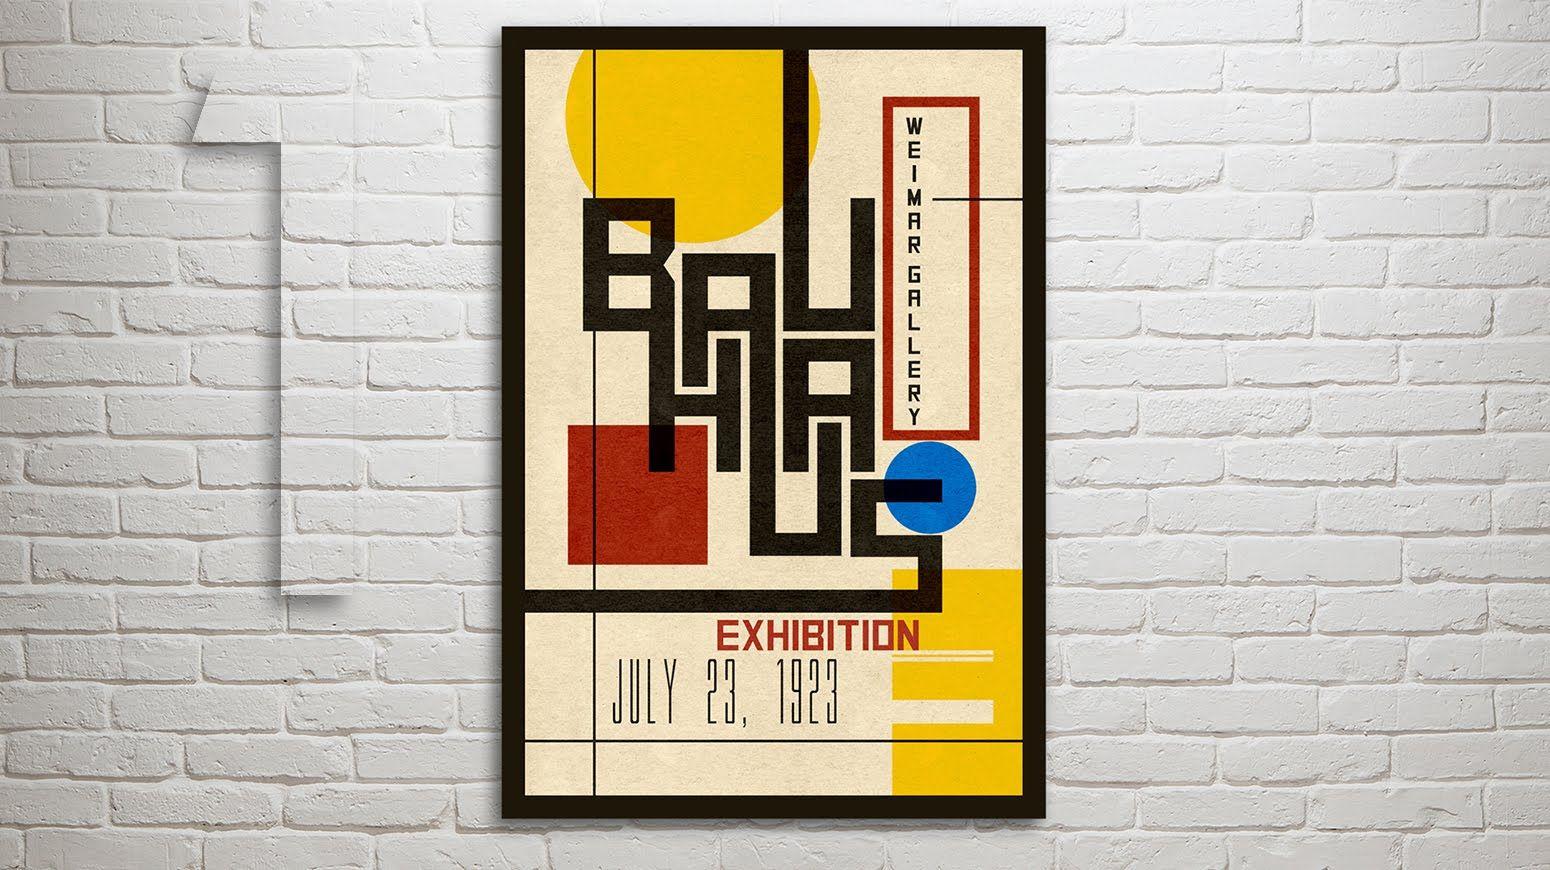 Poster design using photoshop cs5 - Photoshop Part 1 How To Design Create A Vintage Bauhaus Poster